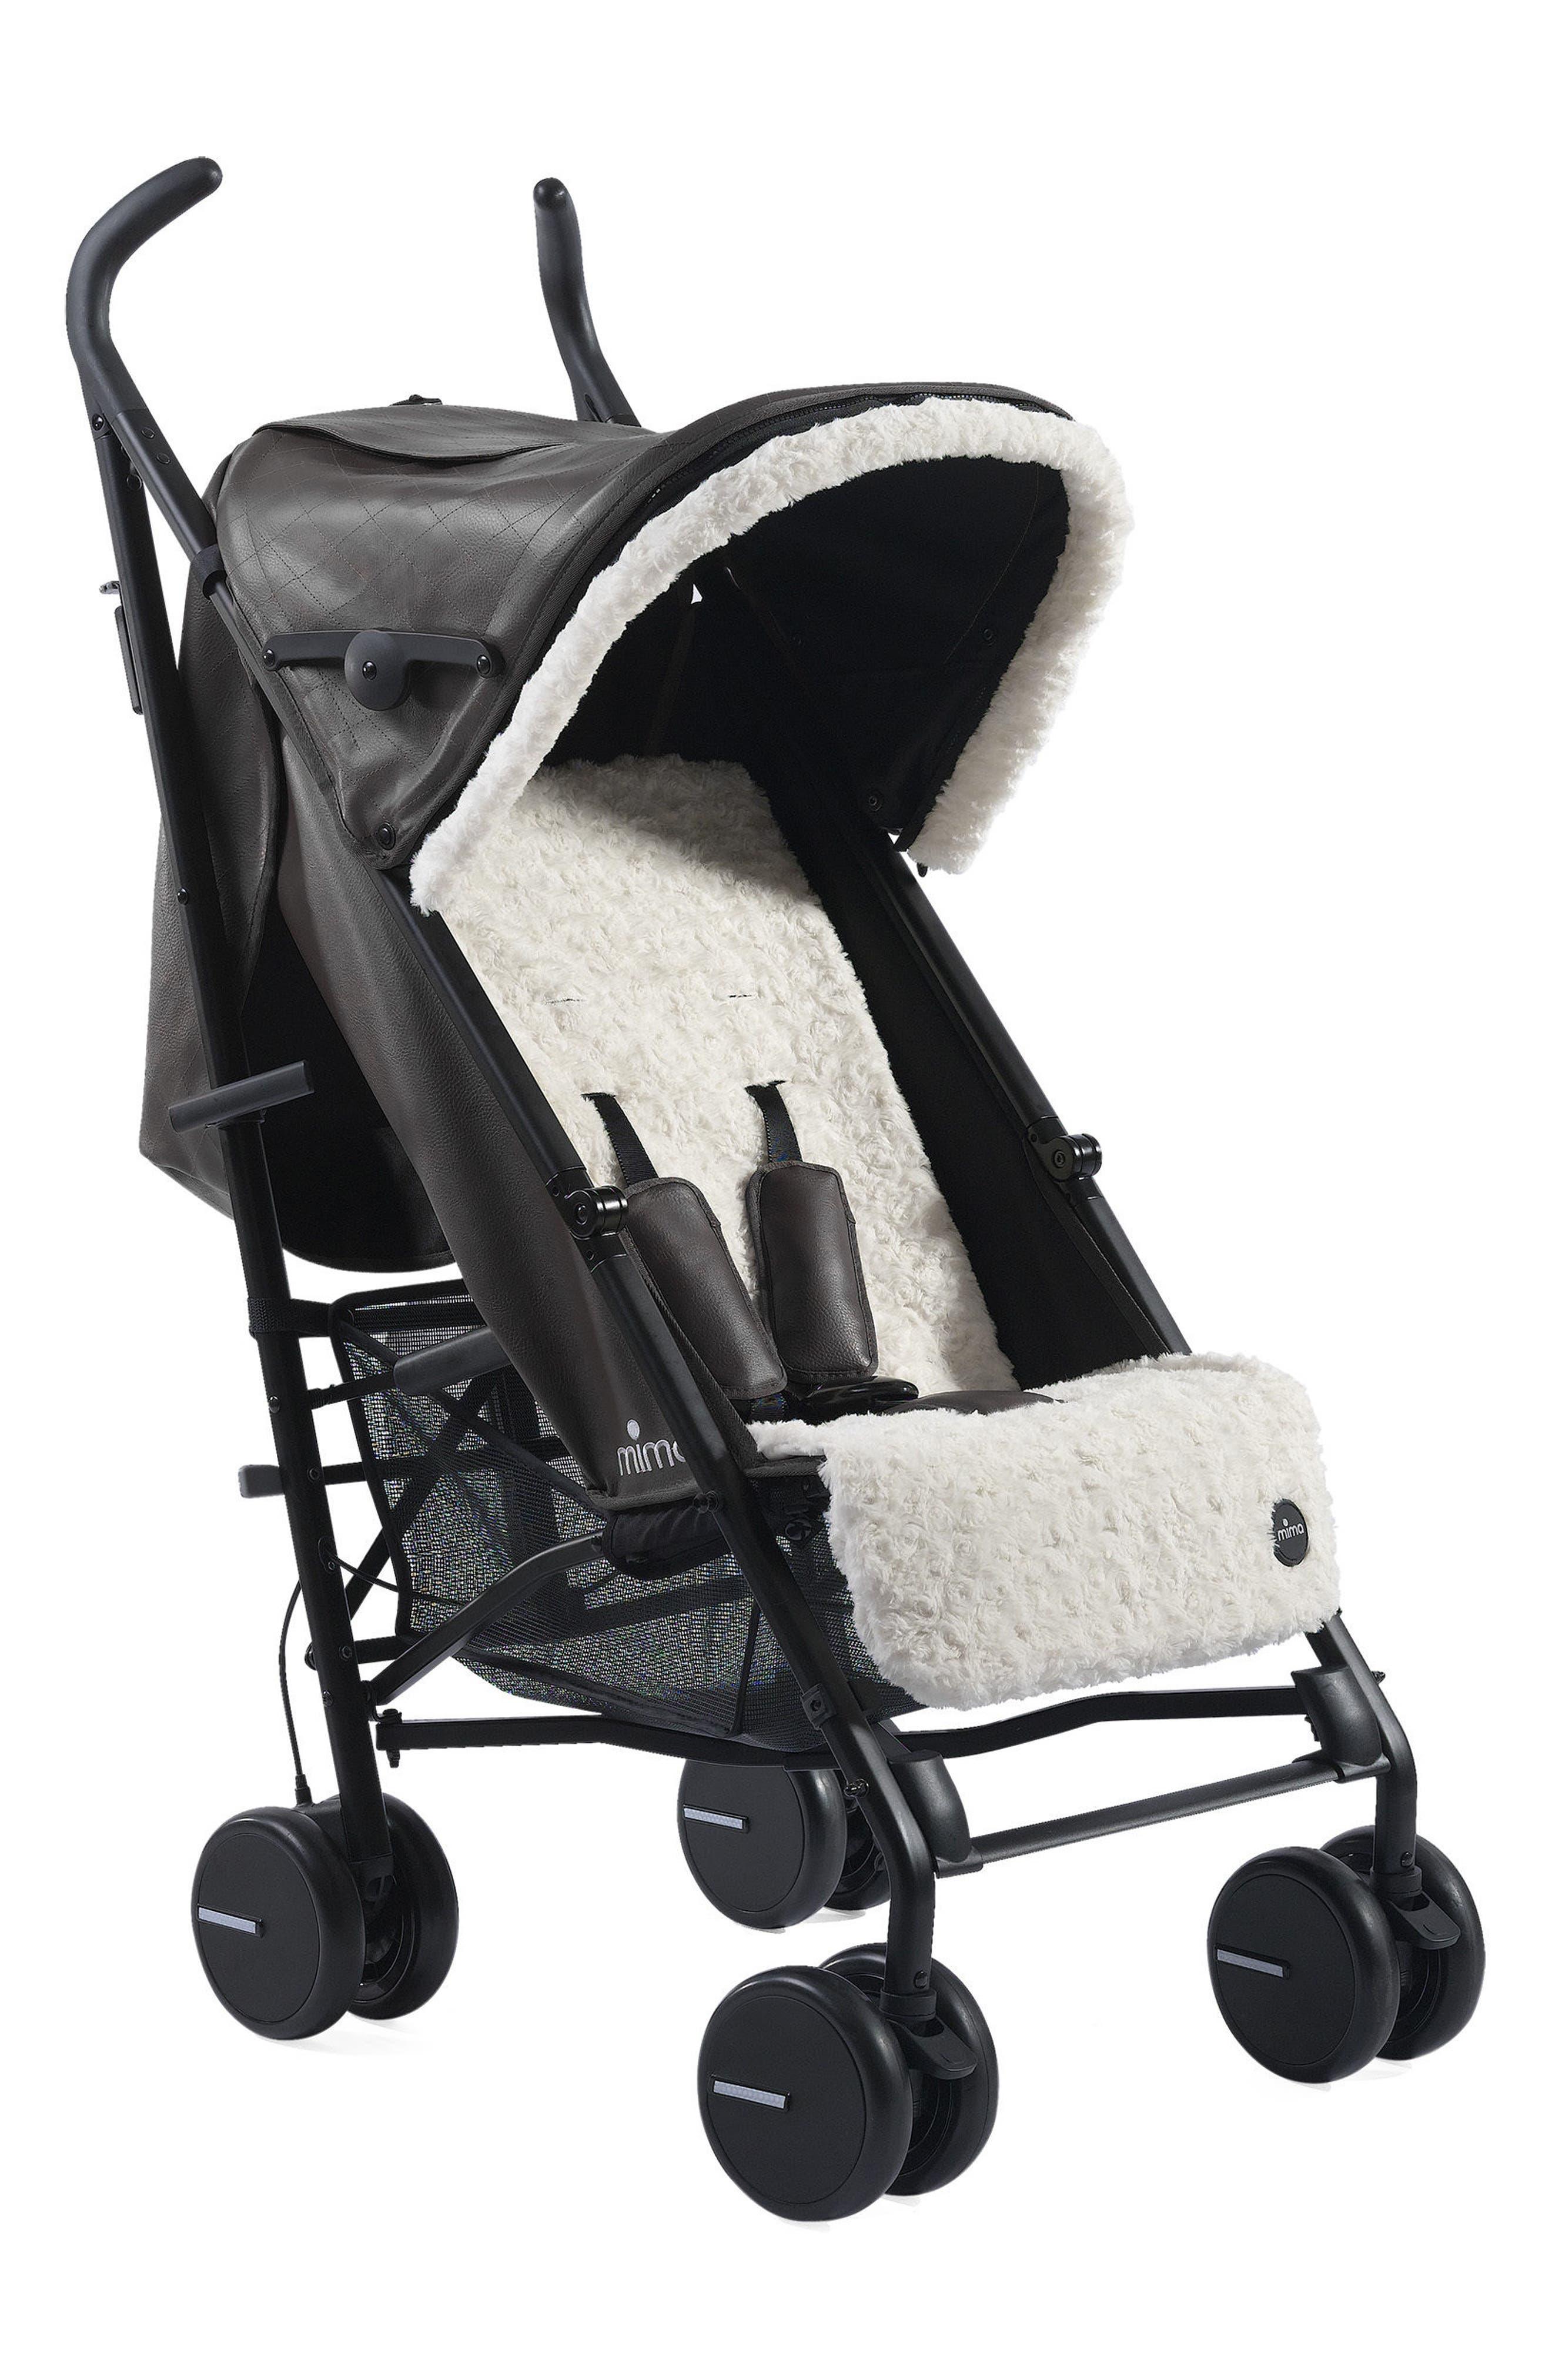 Alternate Image 1 Selected - Mima Sun Duck High Pile Fleece Visor & Seat Liner Fabric Fashion Kit for Mima Bo Stroller